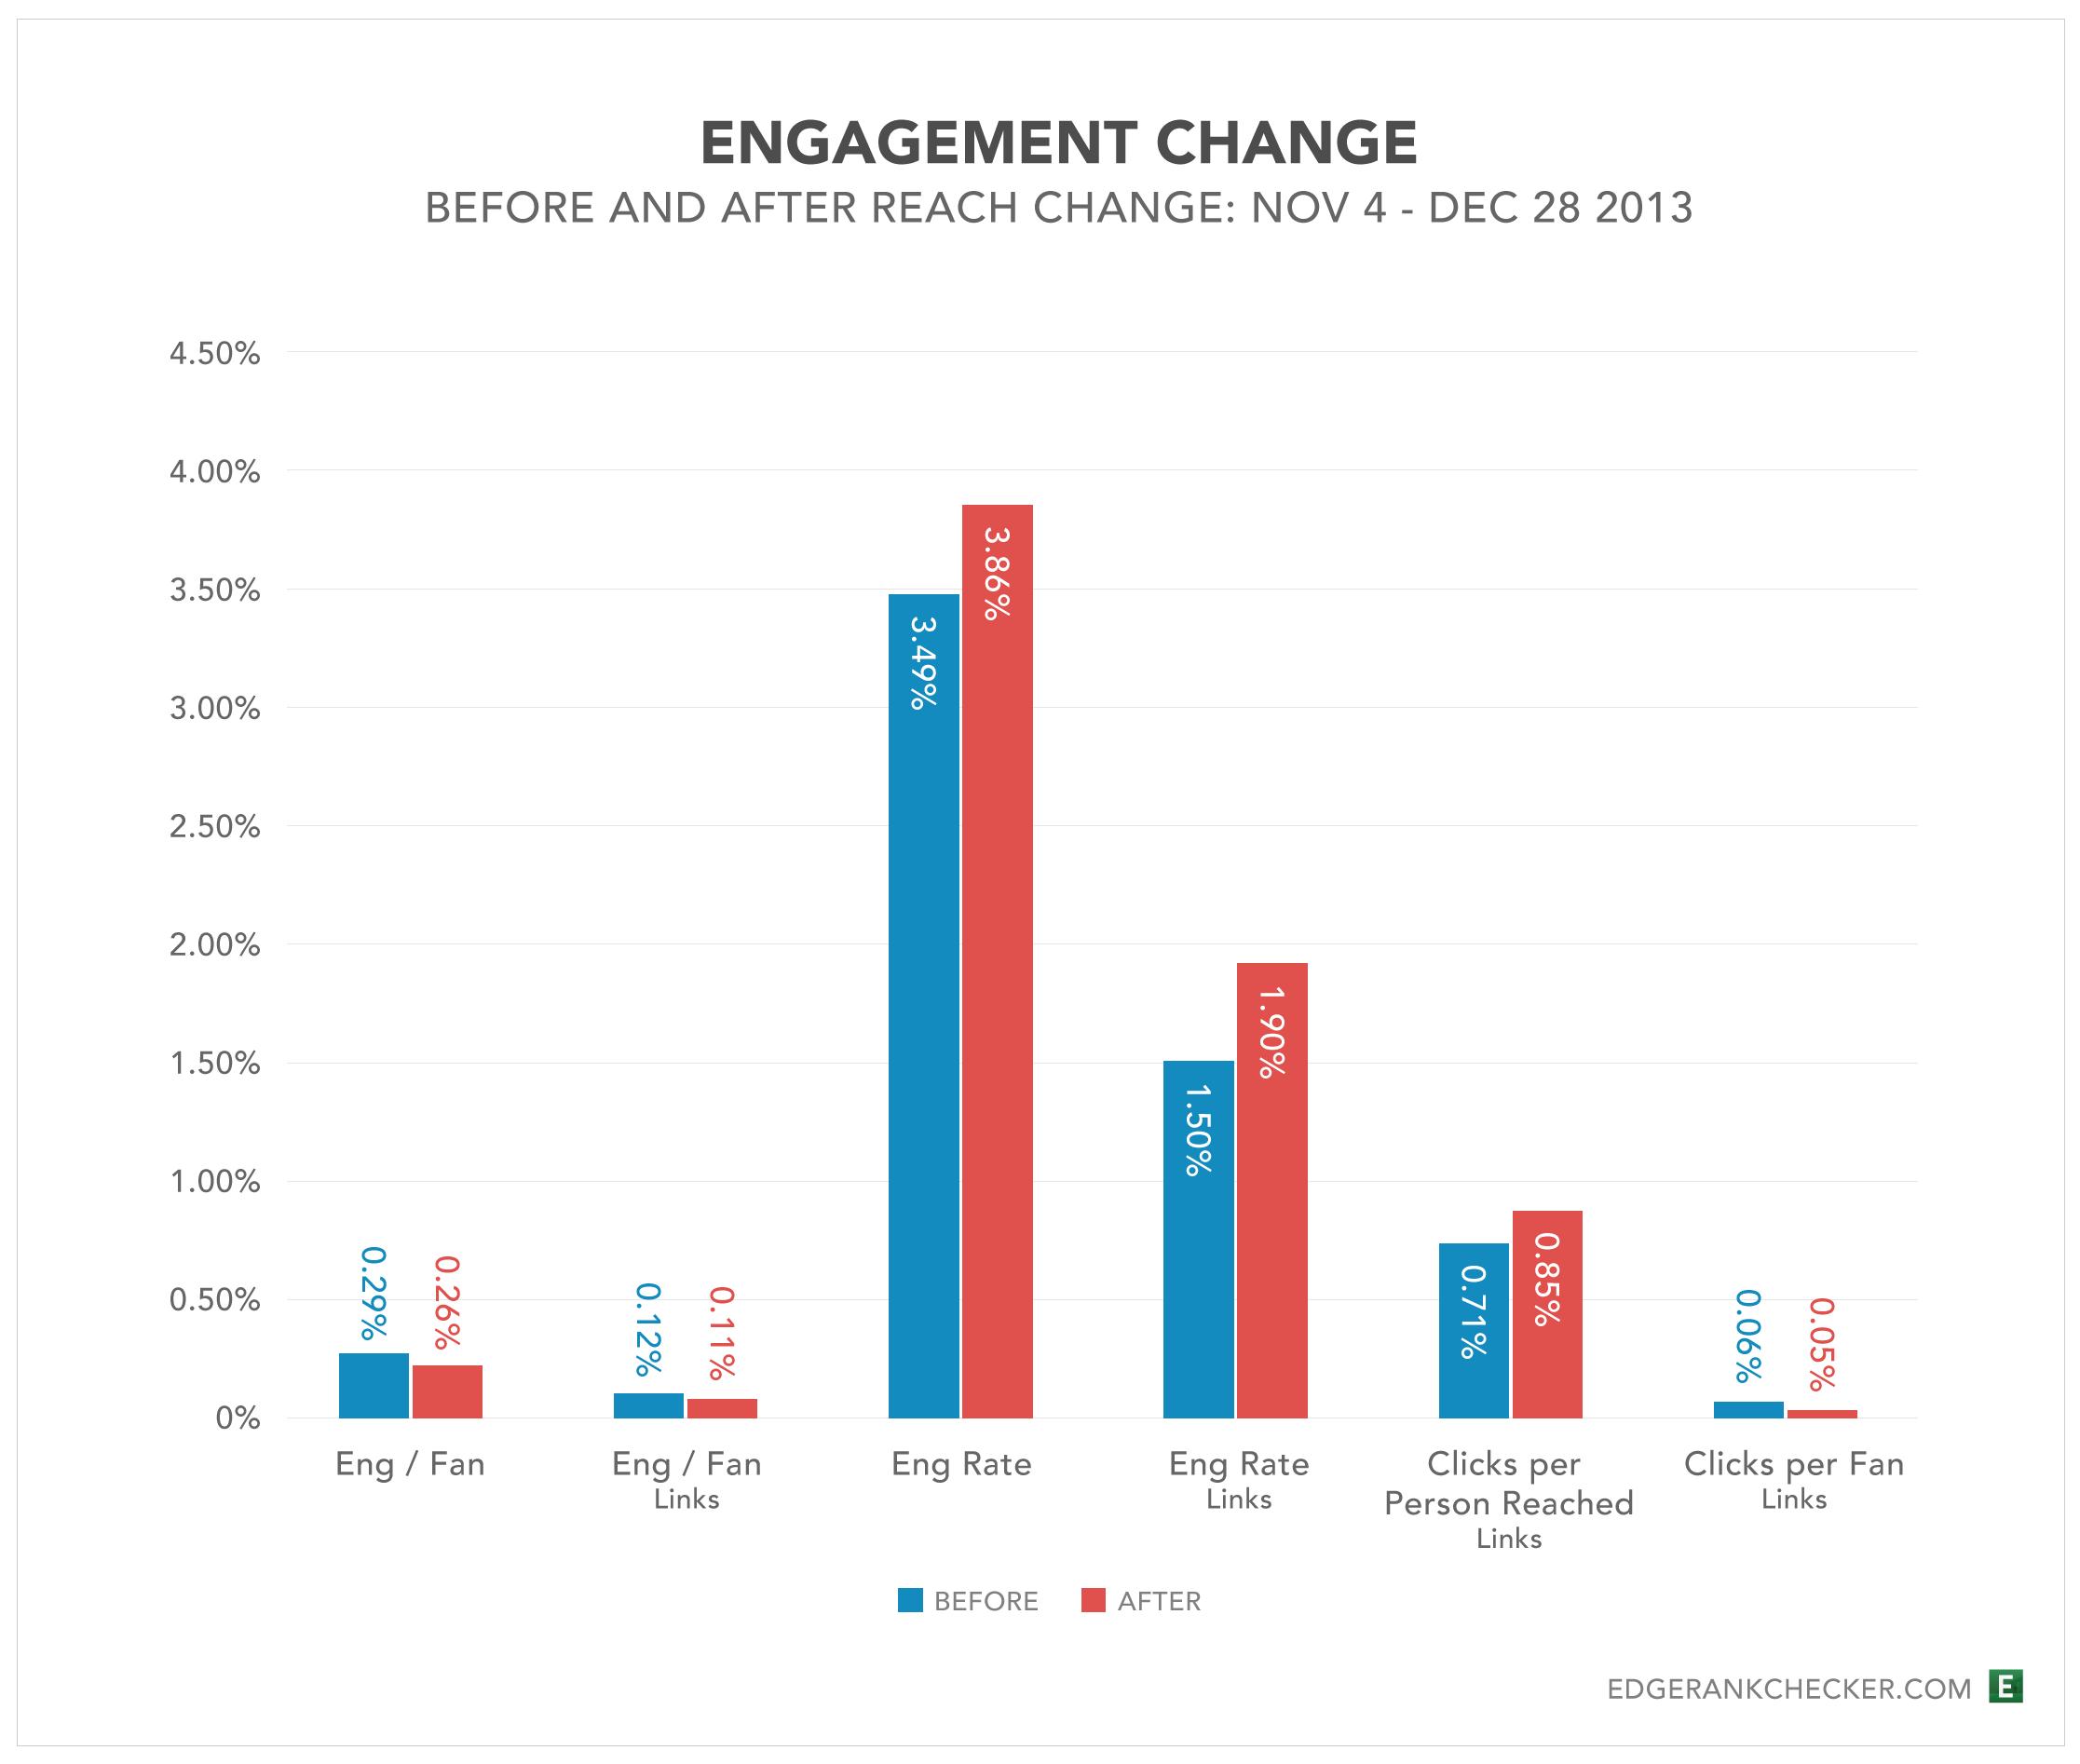 Engagement change